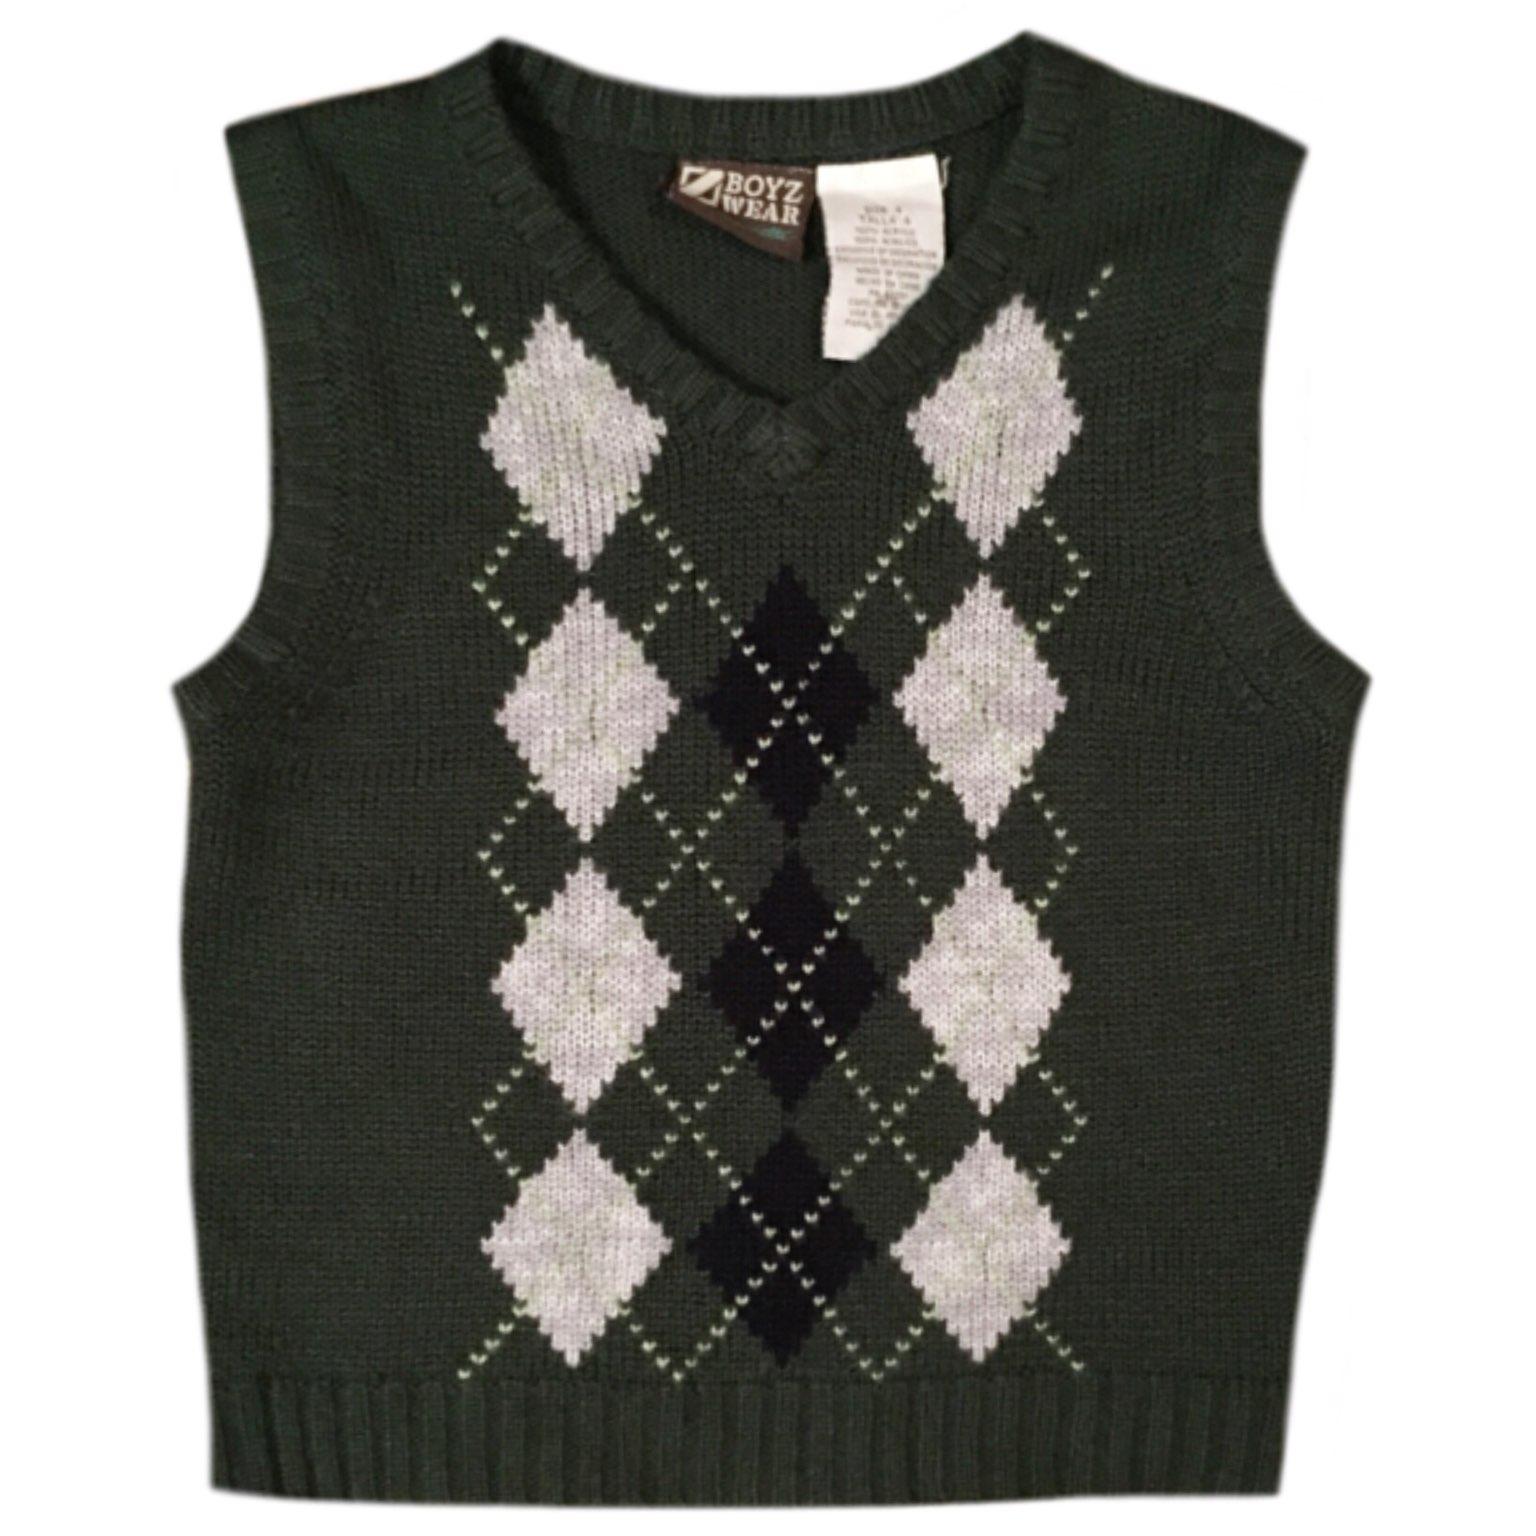 Boyz Wear Green Sweater Vest - Mercari: BUY & SELL THINGS YOU LOVE